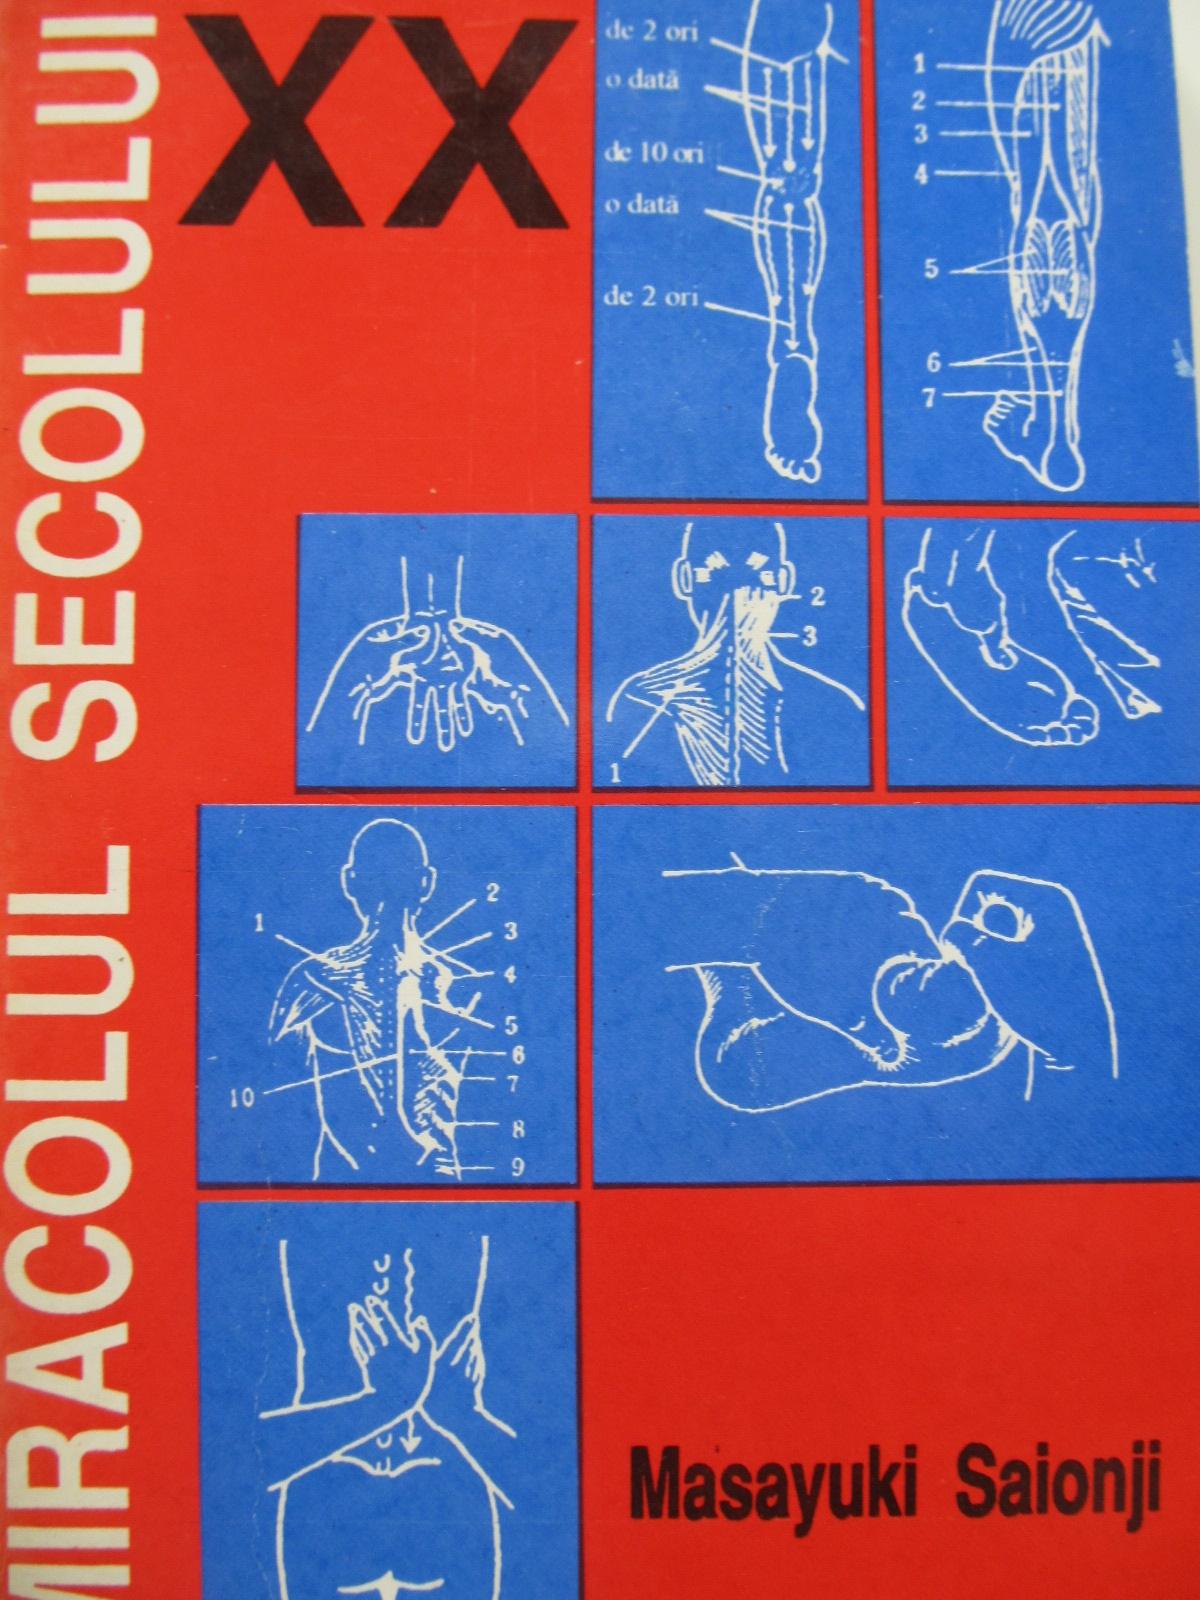 Miracolul secolului XX - Terapia de indreptare a coxalelor prin masaj si presopunctura - Masayuki Saionji | Detalii carte